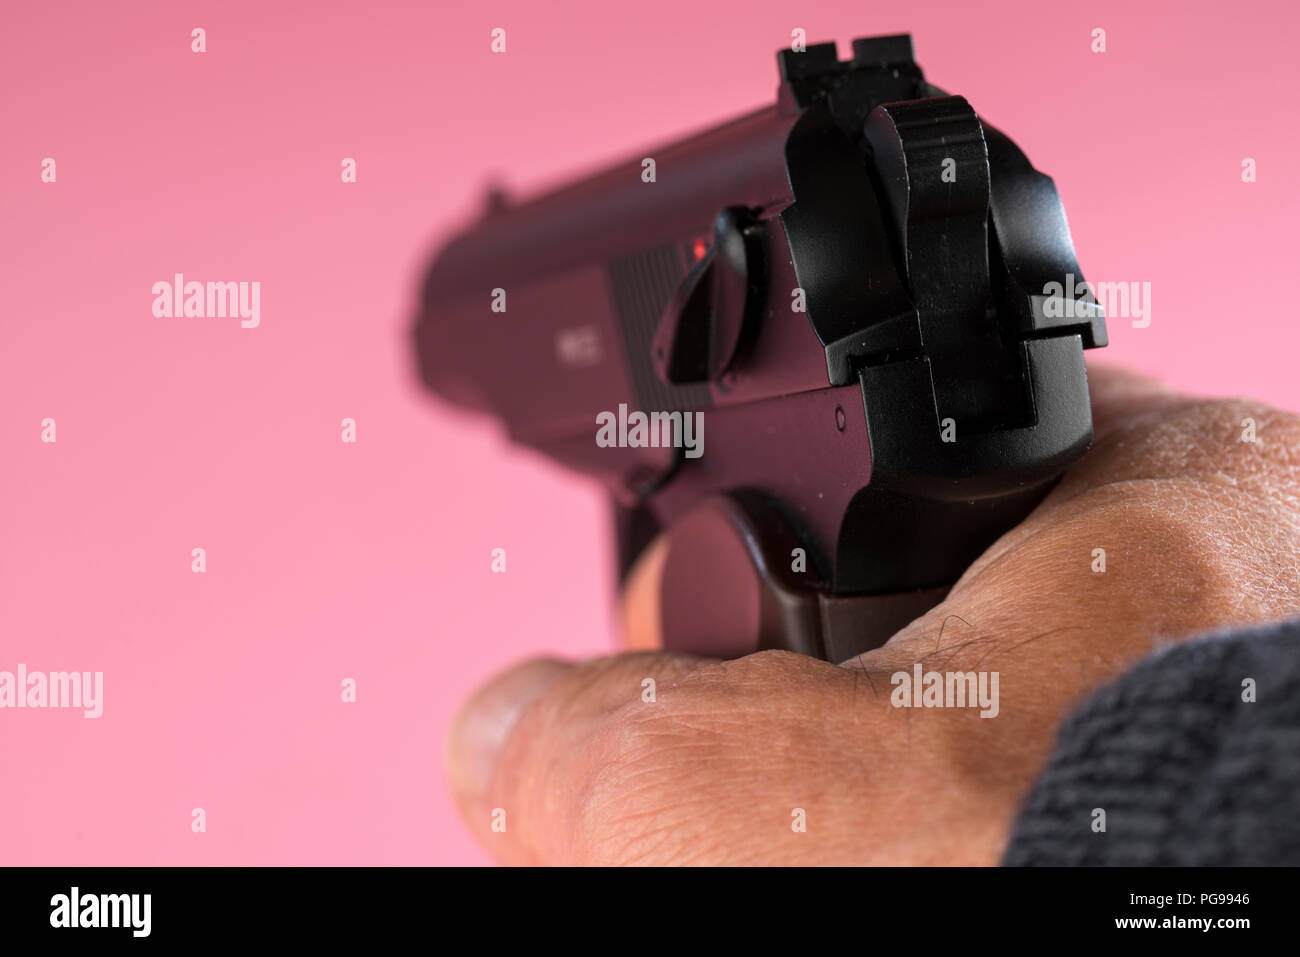 Male hand aiming gun. - Stock Image